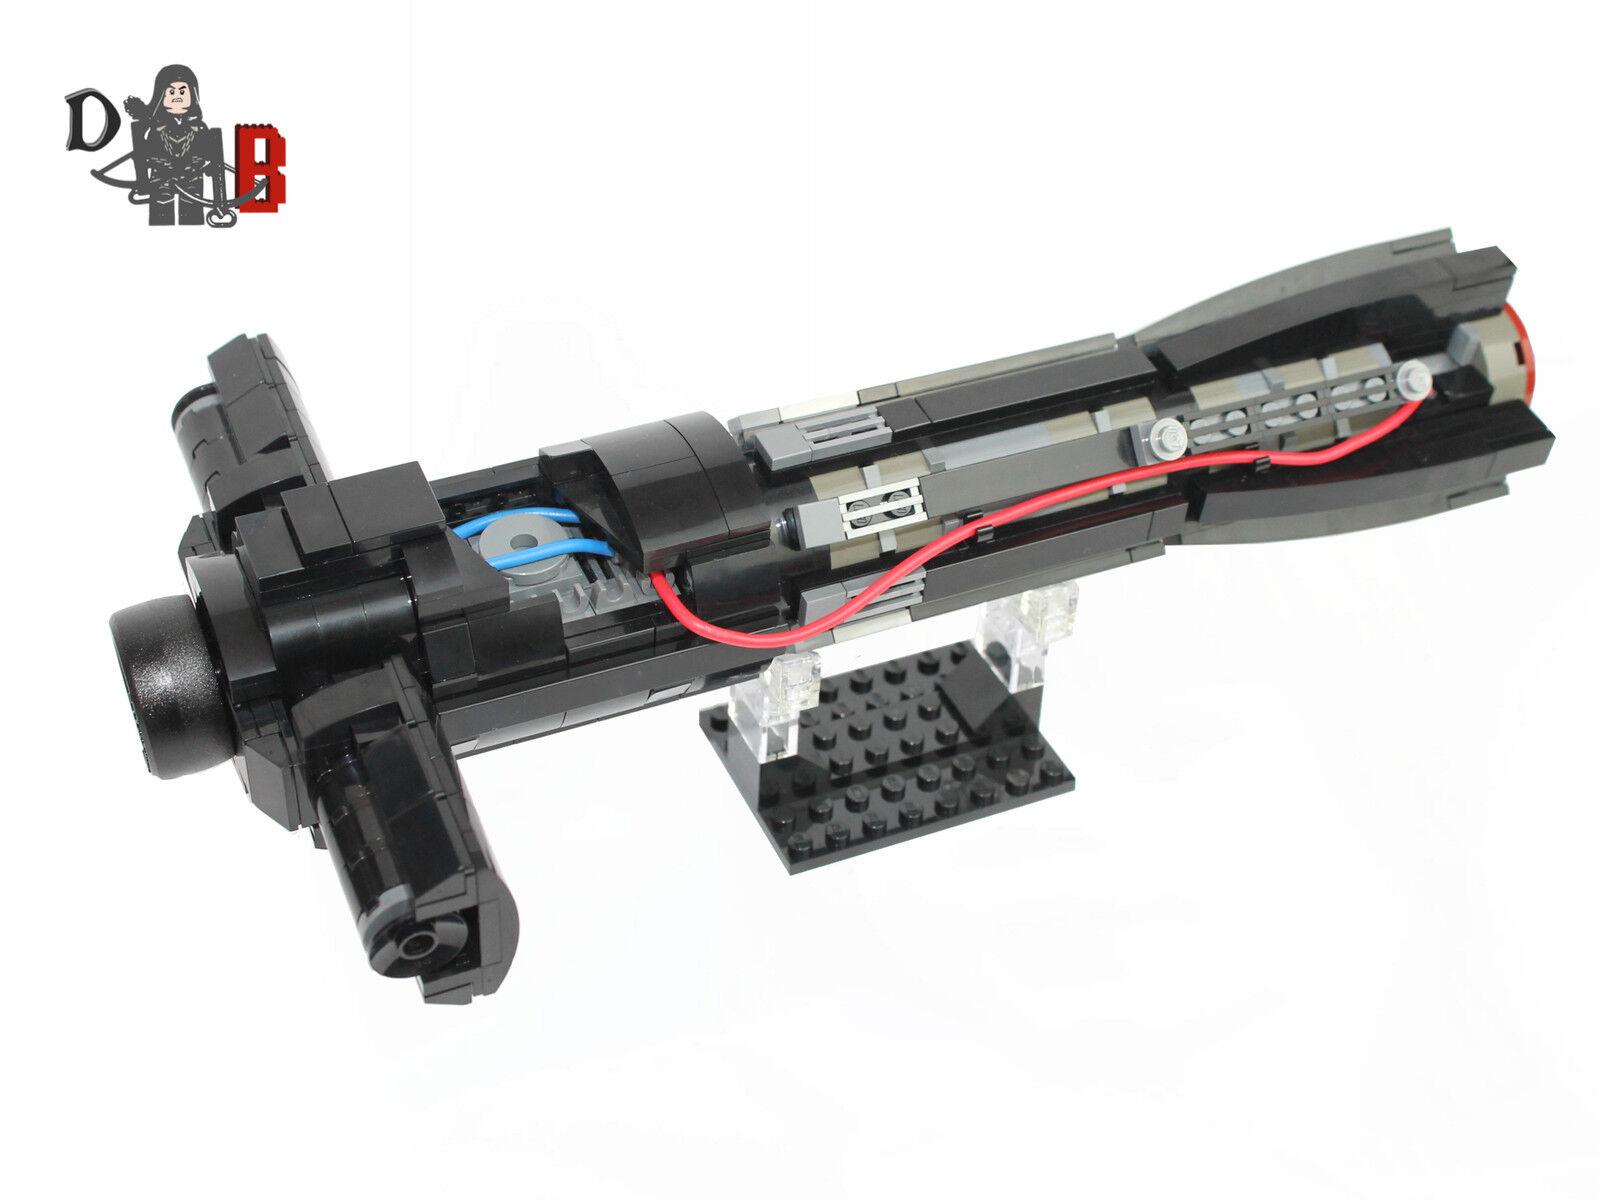 STAR Wars kylo REN TFA CUSTOM famosa spada laser inverosimile effettuate utilizzando le parti LEGO